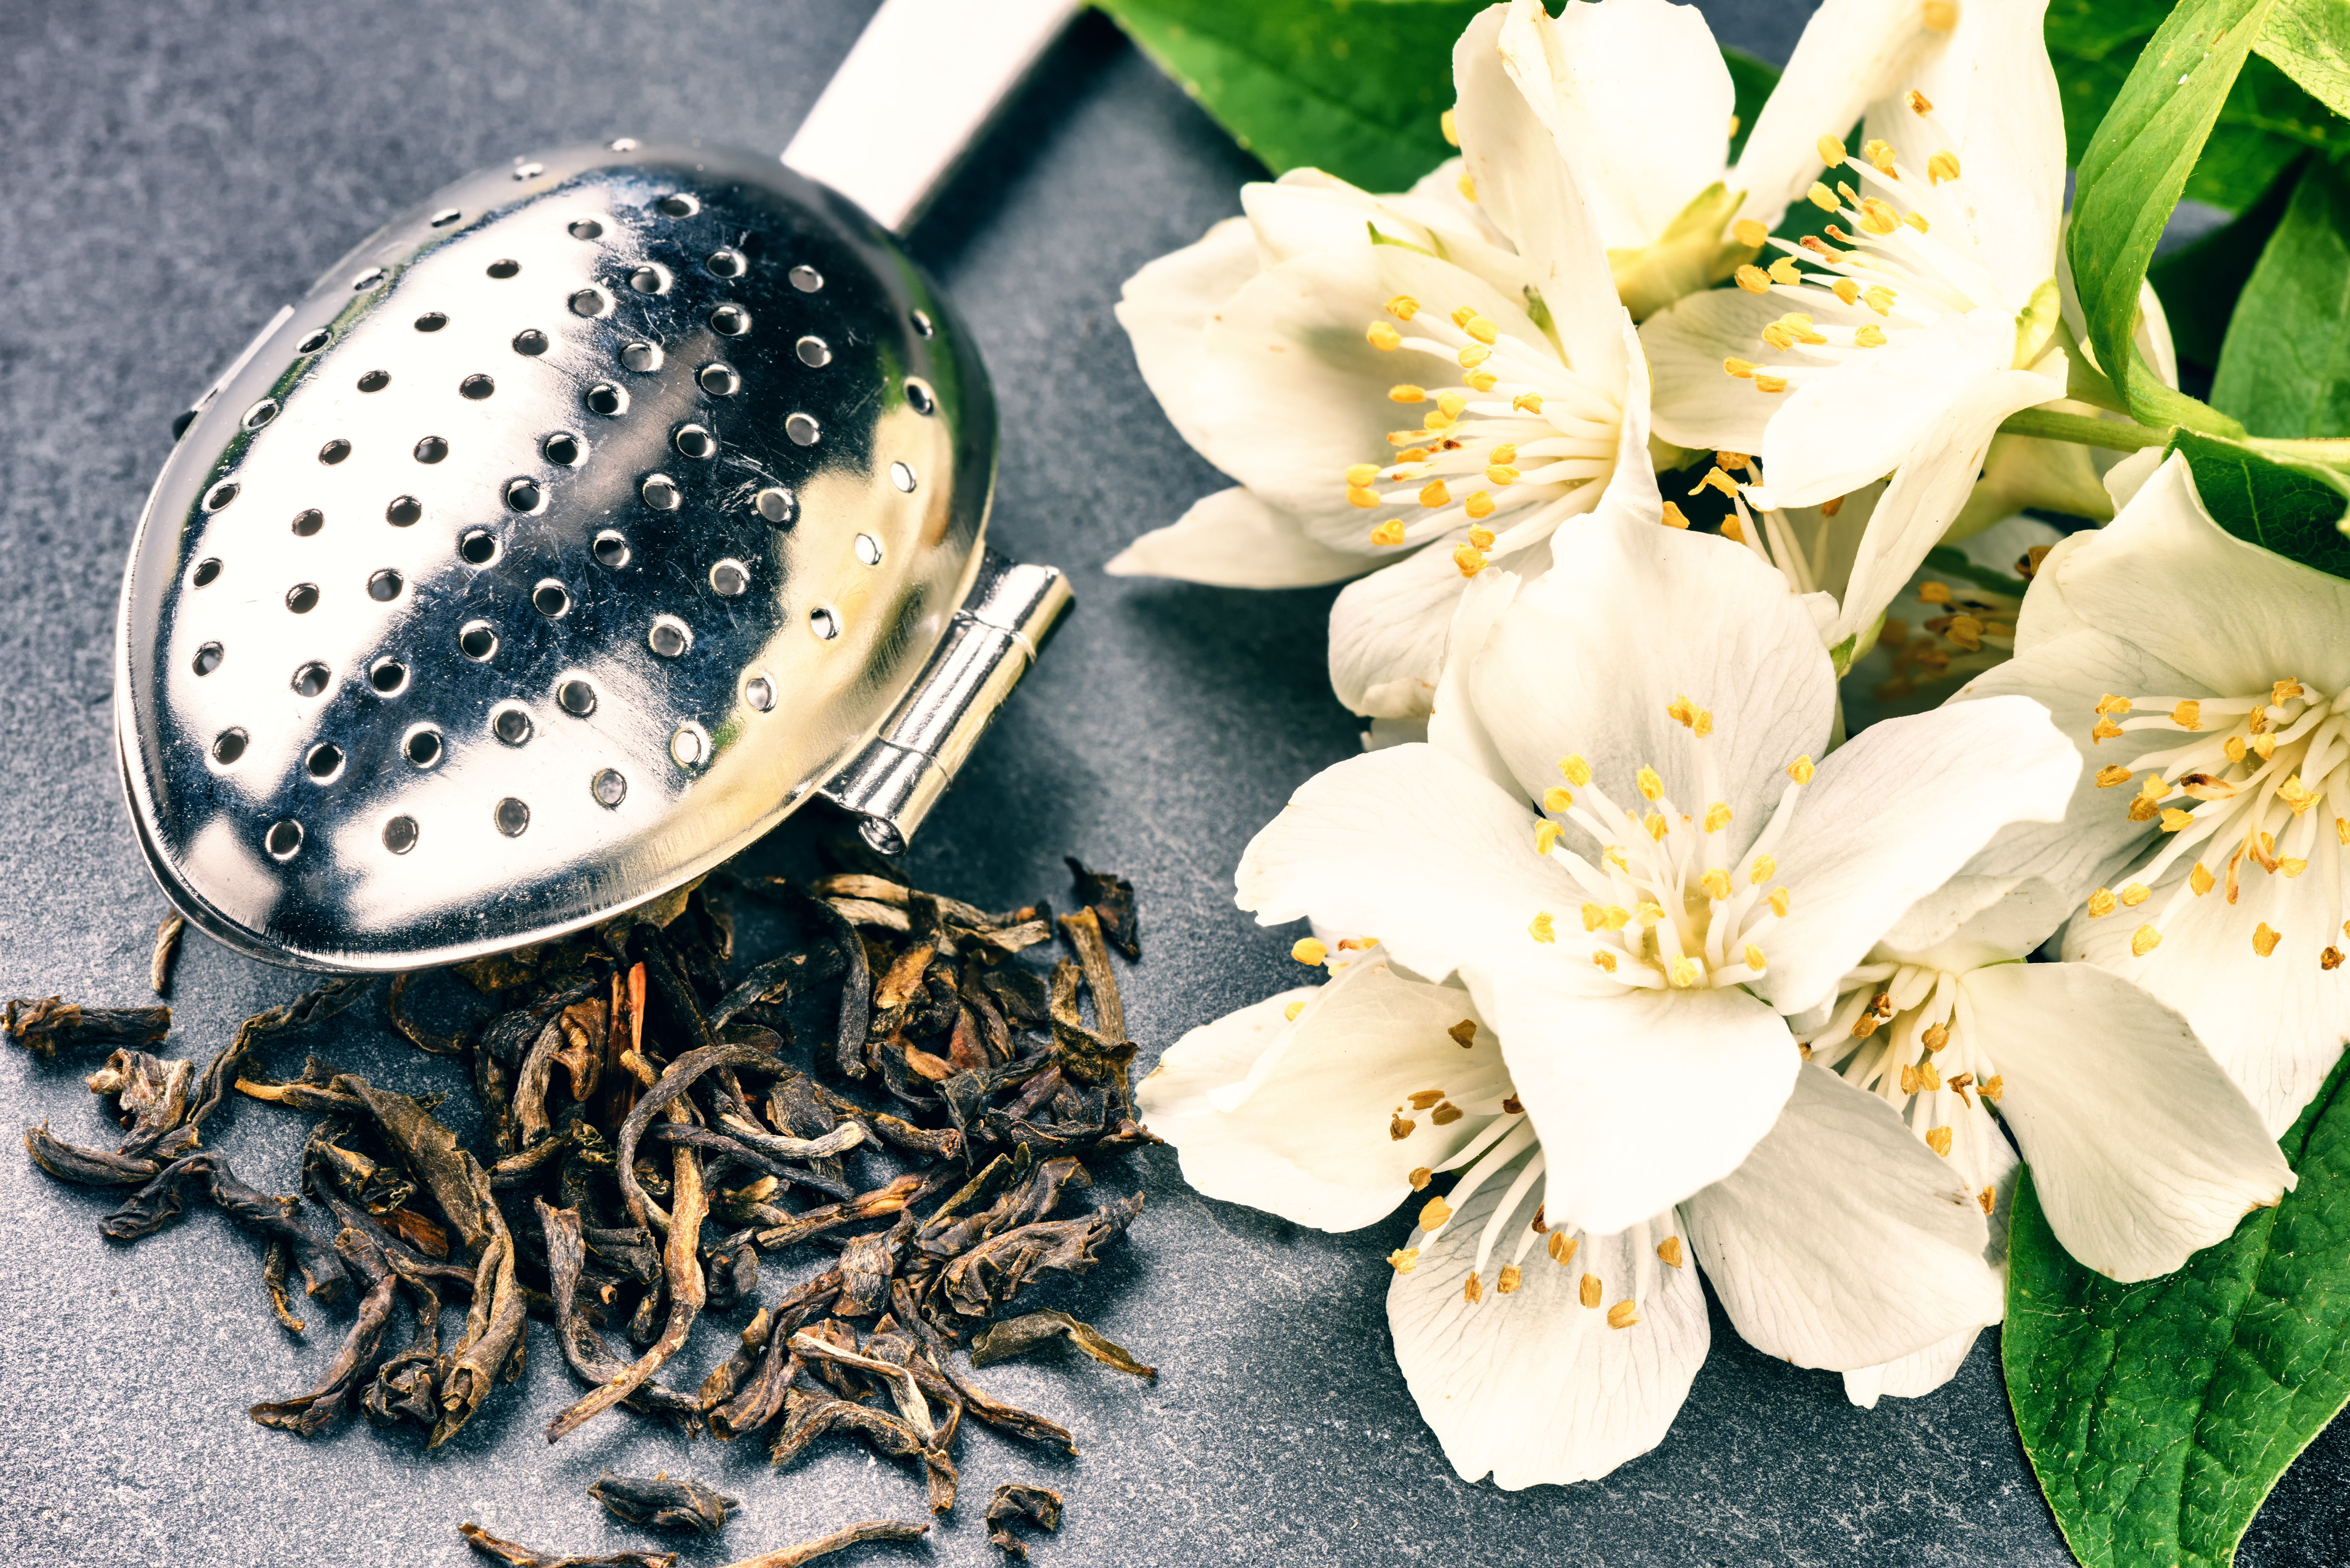 Tea Infuser Spoon With Dry Green Tea Leaves And Jasmine Flowers